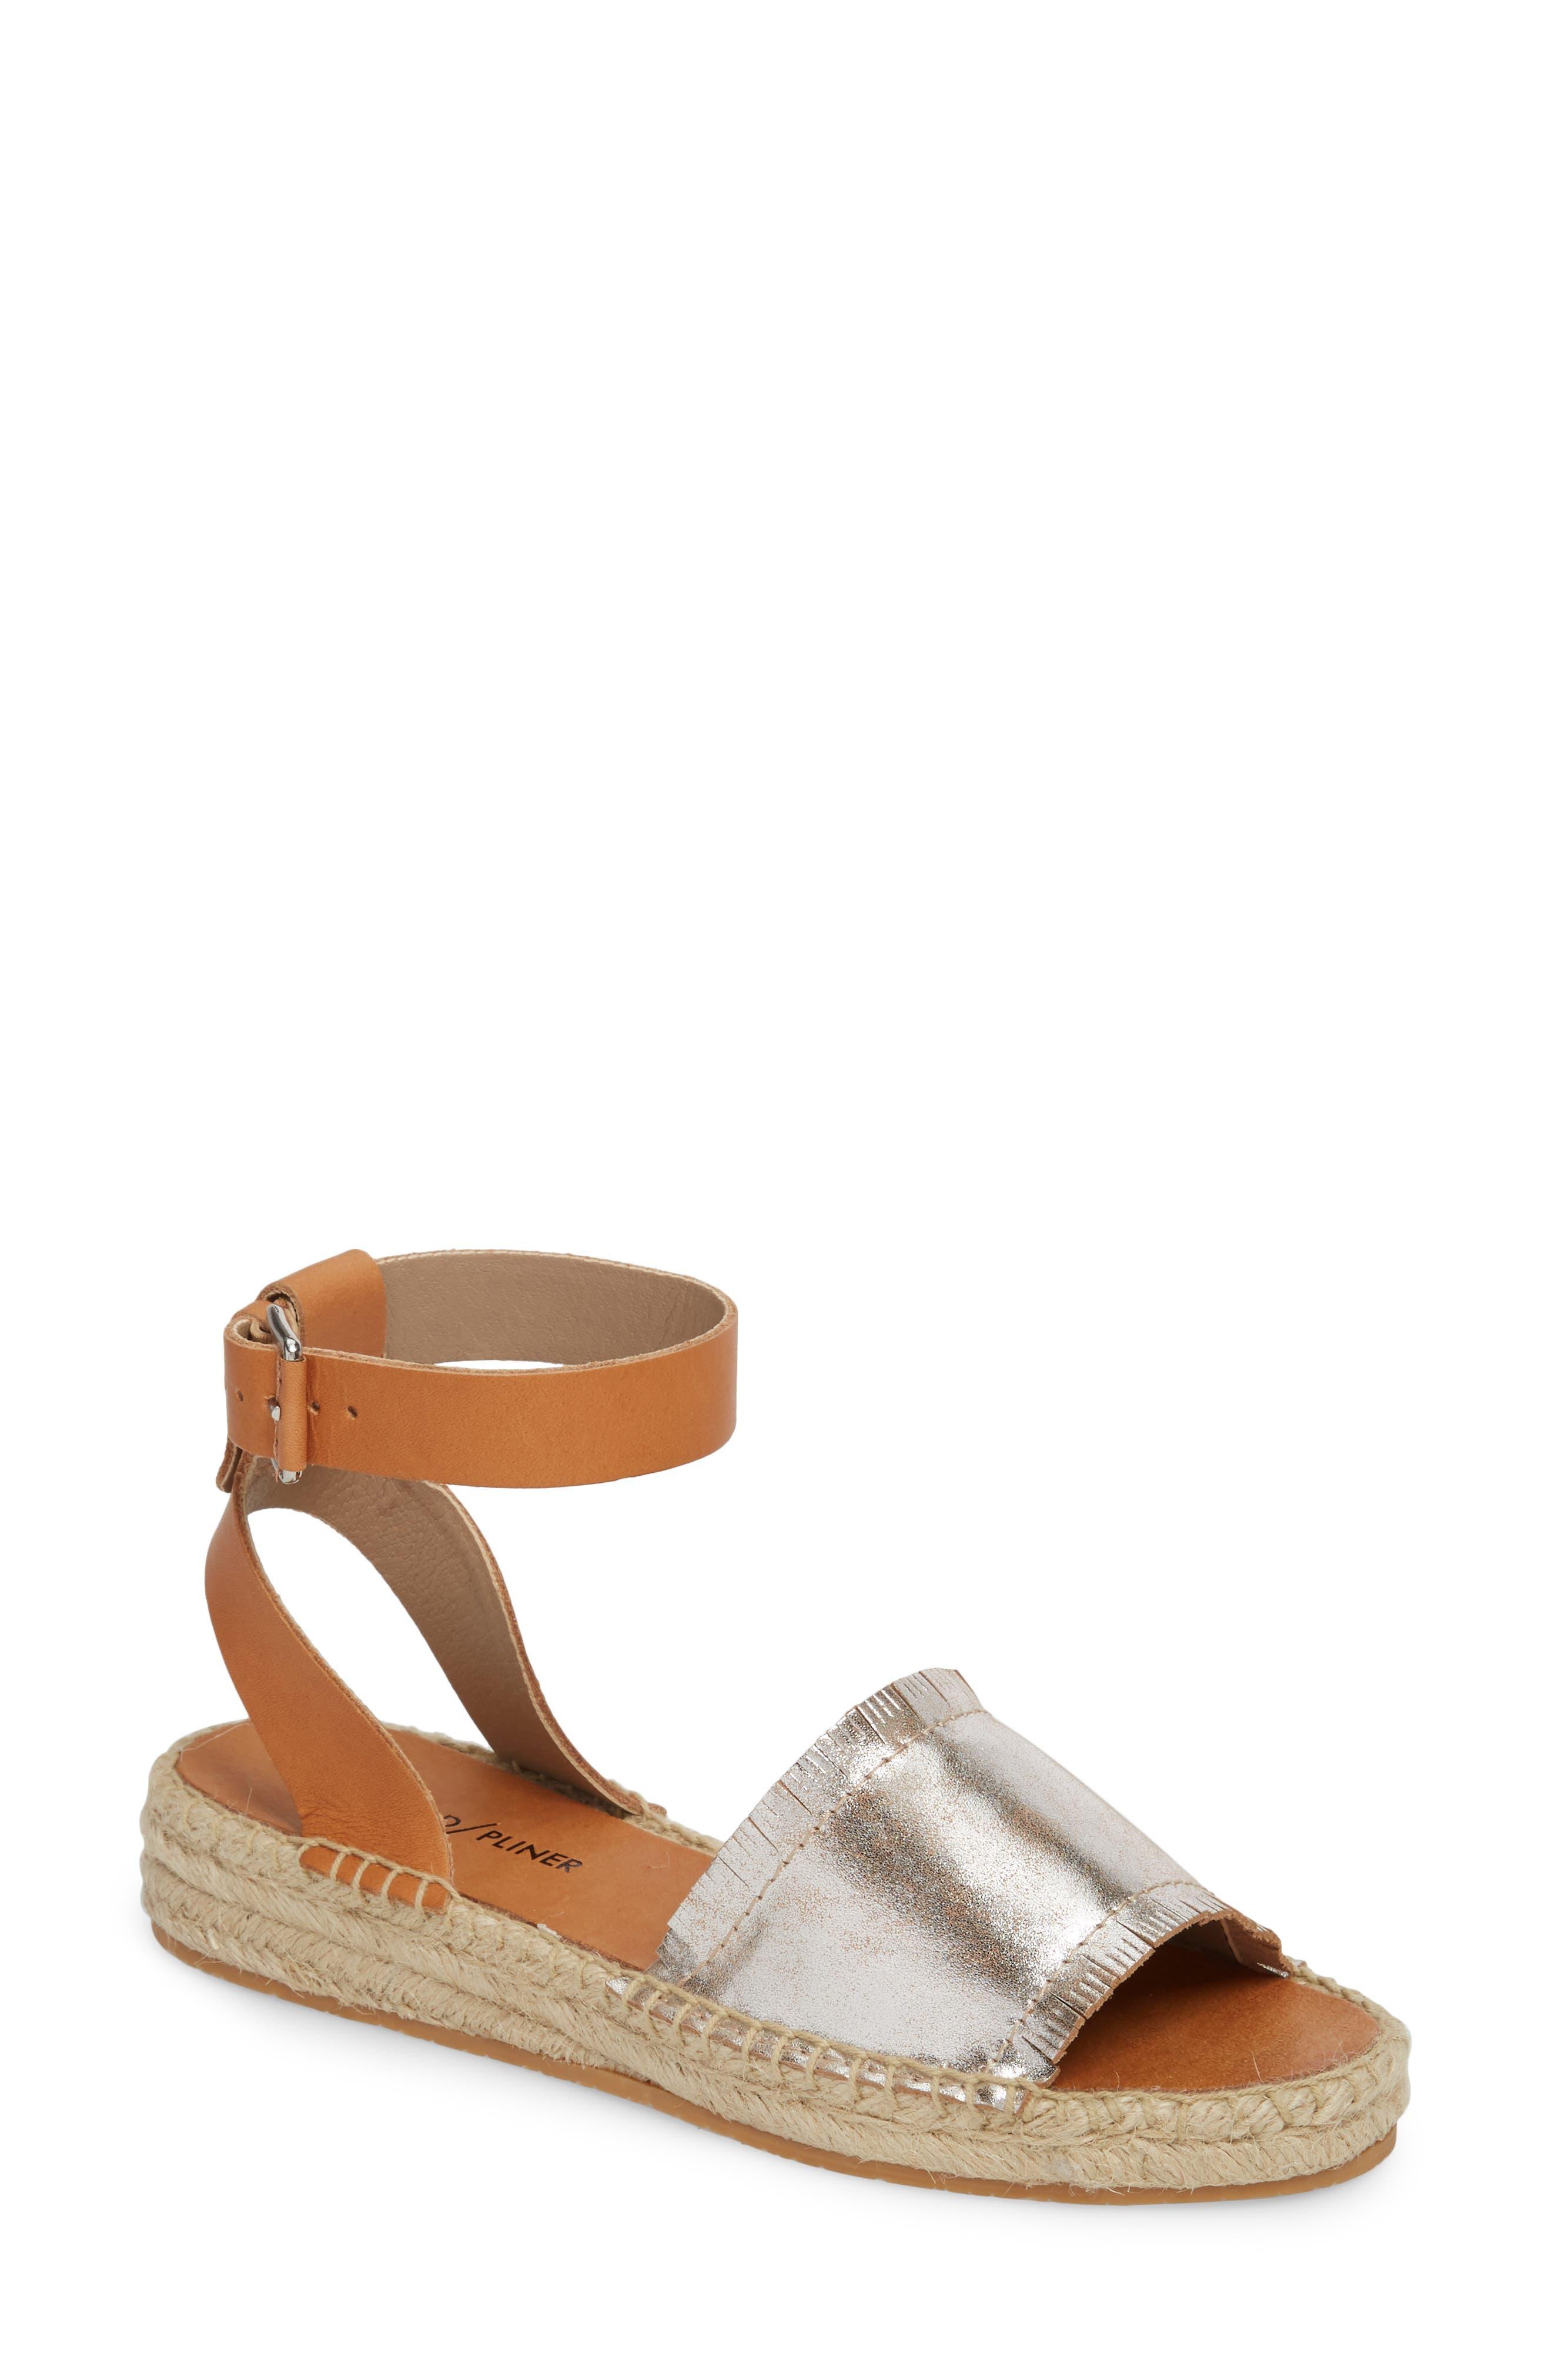 Donald Pliner Rowen Espadrille Sandal (Women)